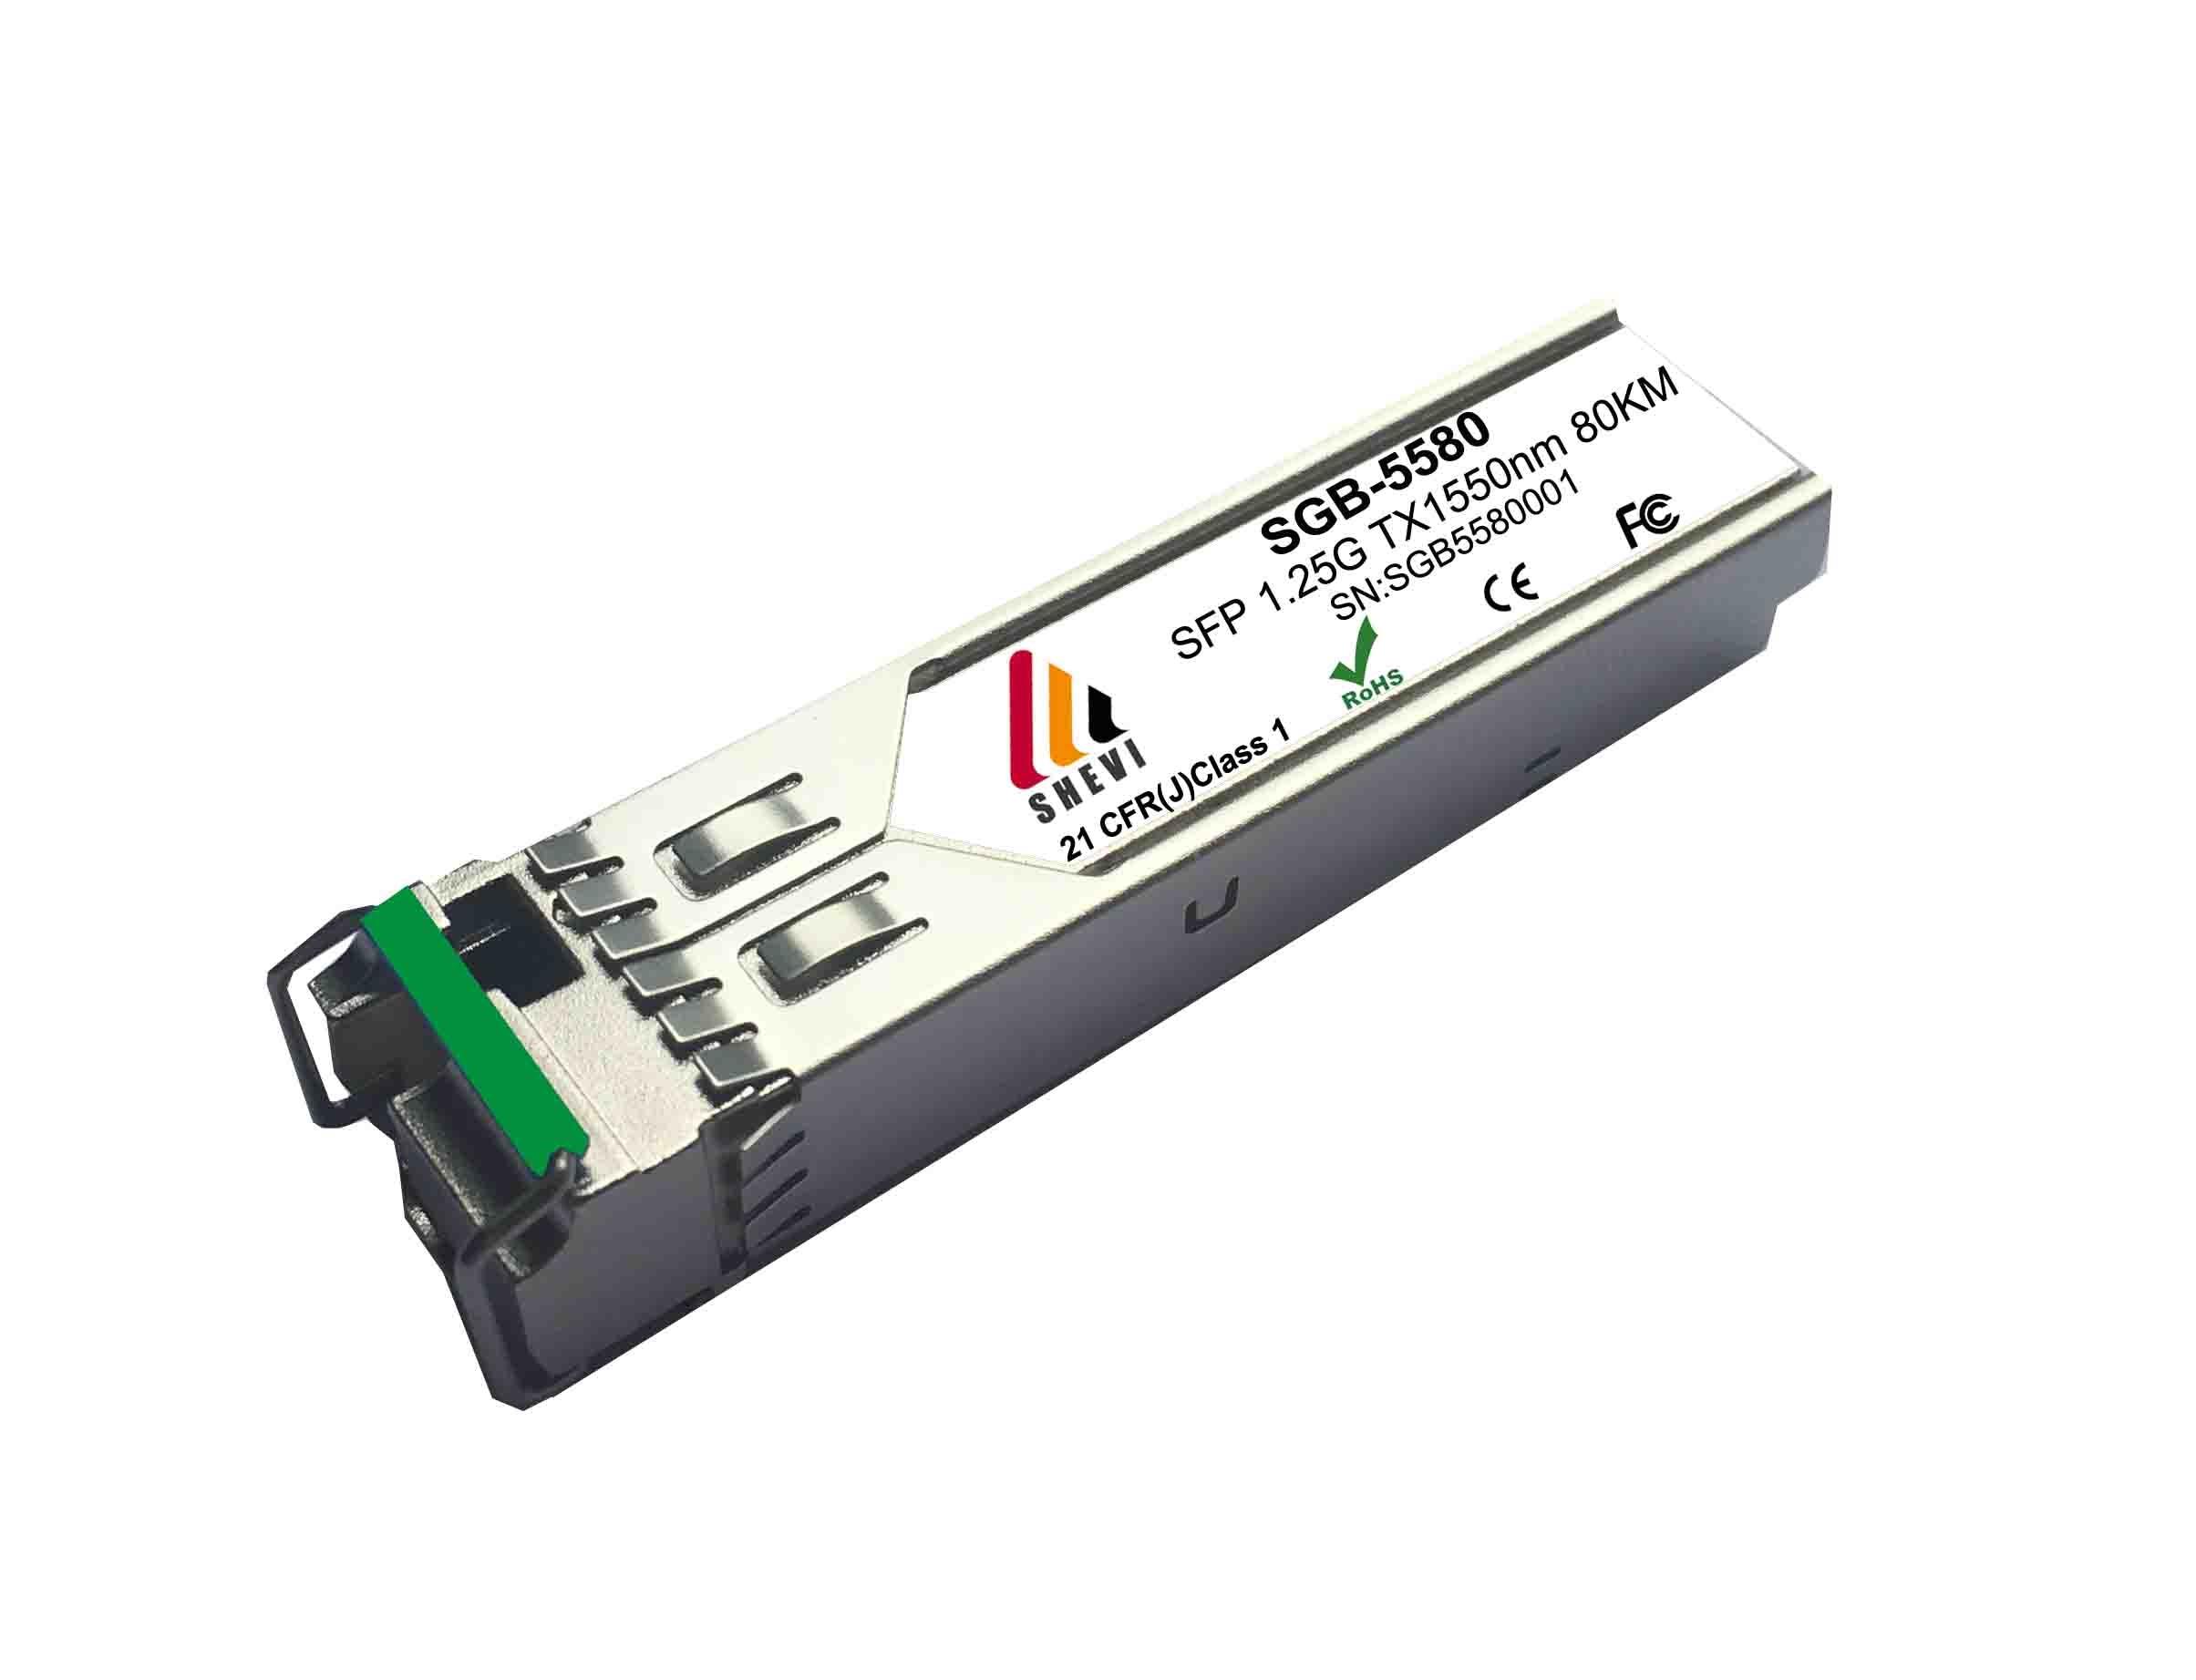 1.25G Ethernet SFP جهاز إرسال واستقبال 1550/1490nm 80 كجم BIDI 1.25g sfp BIDI huawei جهاز إرسال واستقبال H3C Moxa